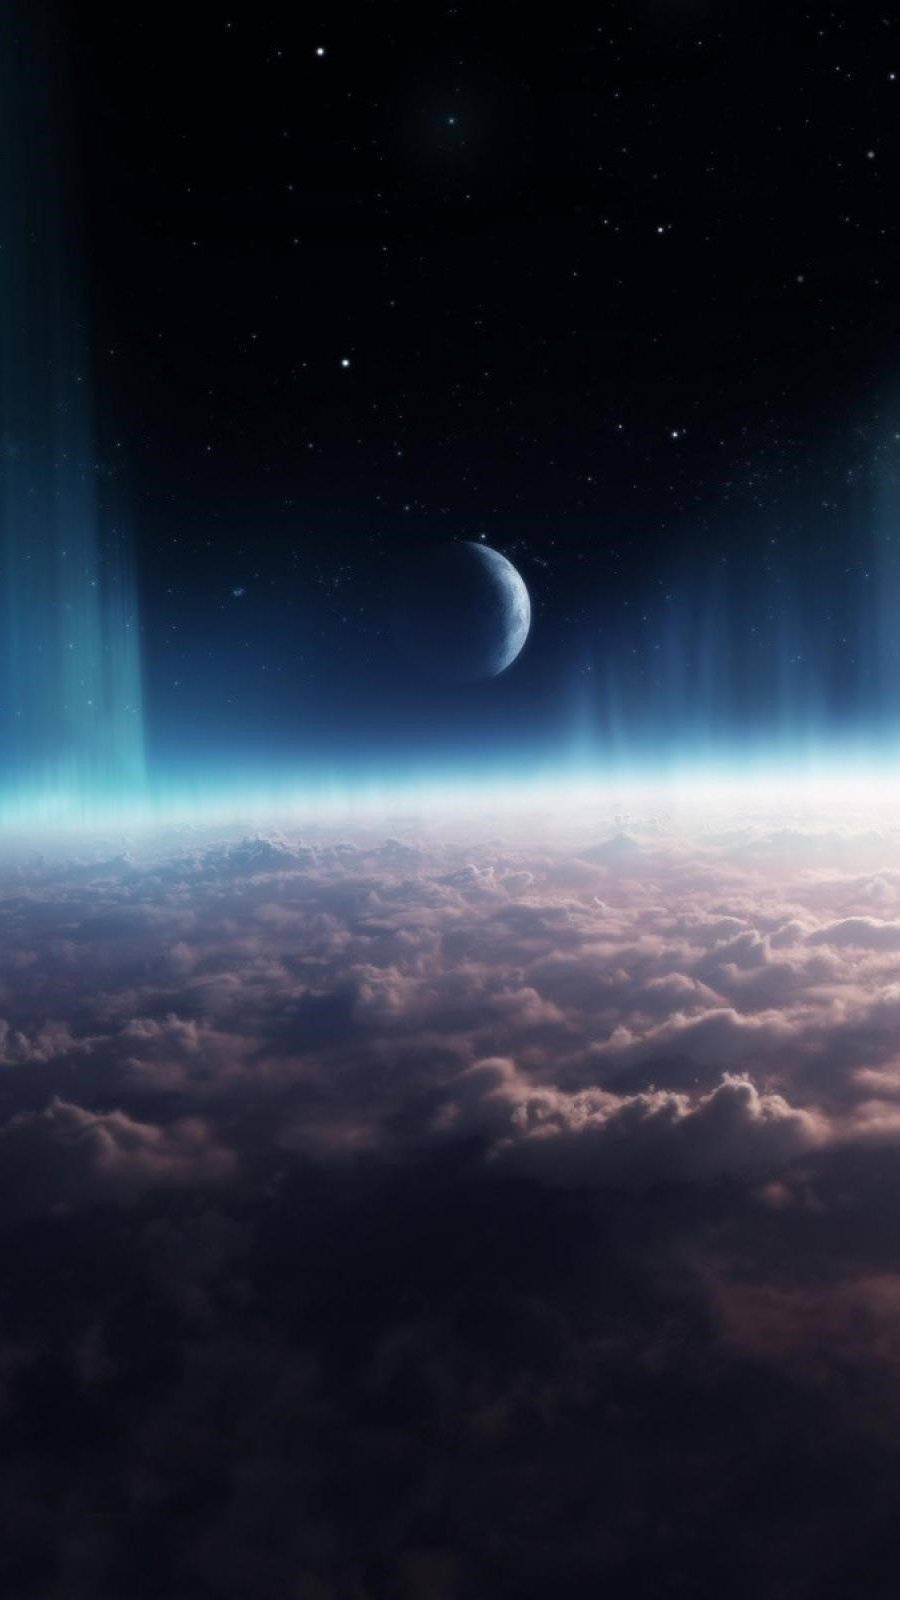 Fondos de pantalla Universo - Espacio con nubes Vertical